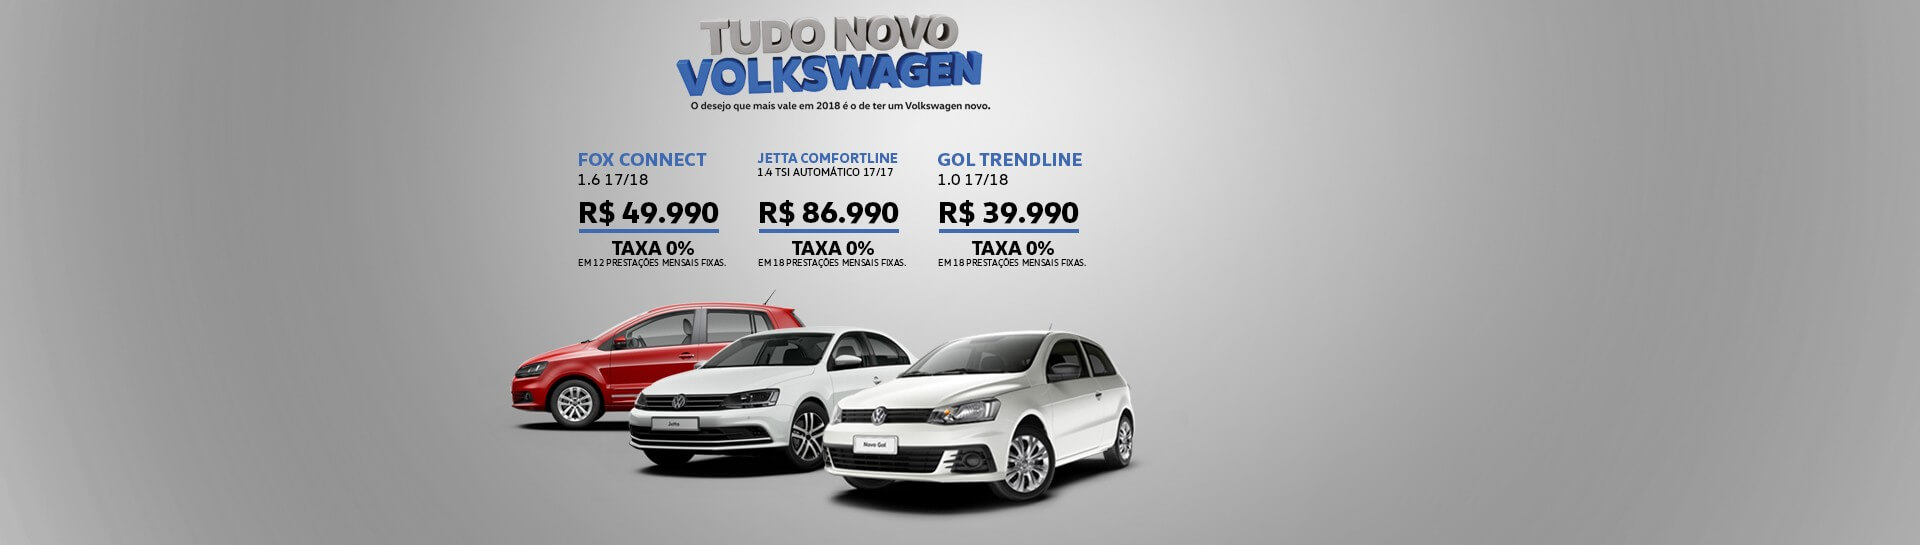 Tudo novo Volkswagen 1